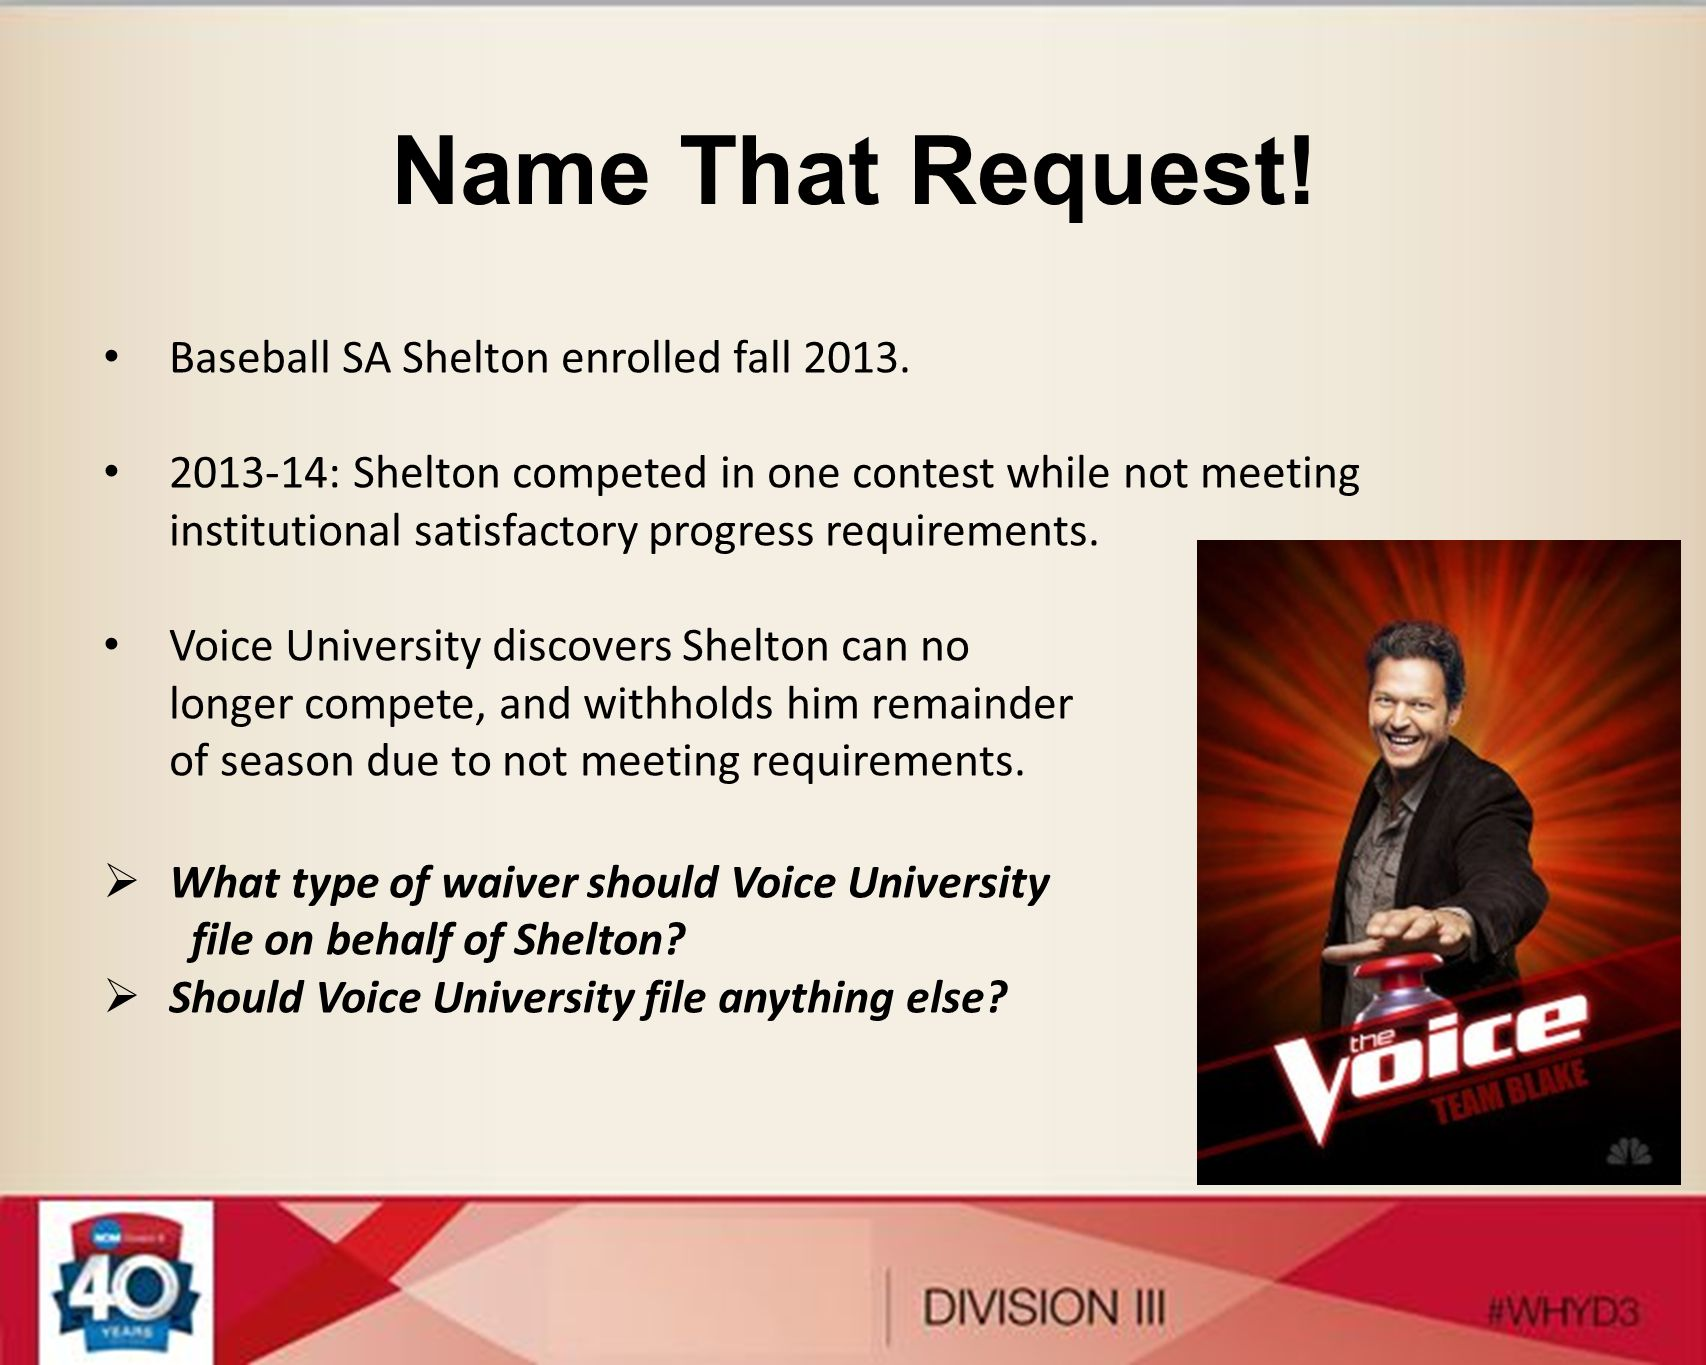 Name That Request! Baseball SA Shelton enrolled fall 2013.